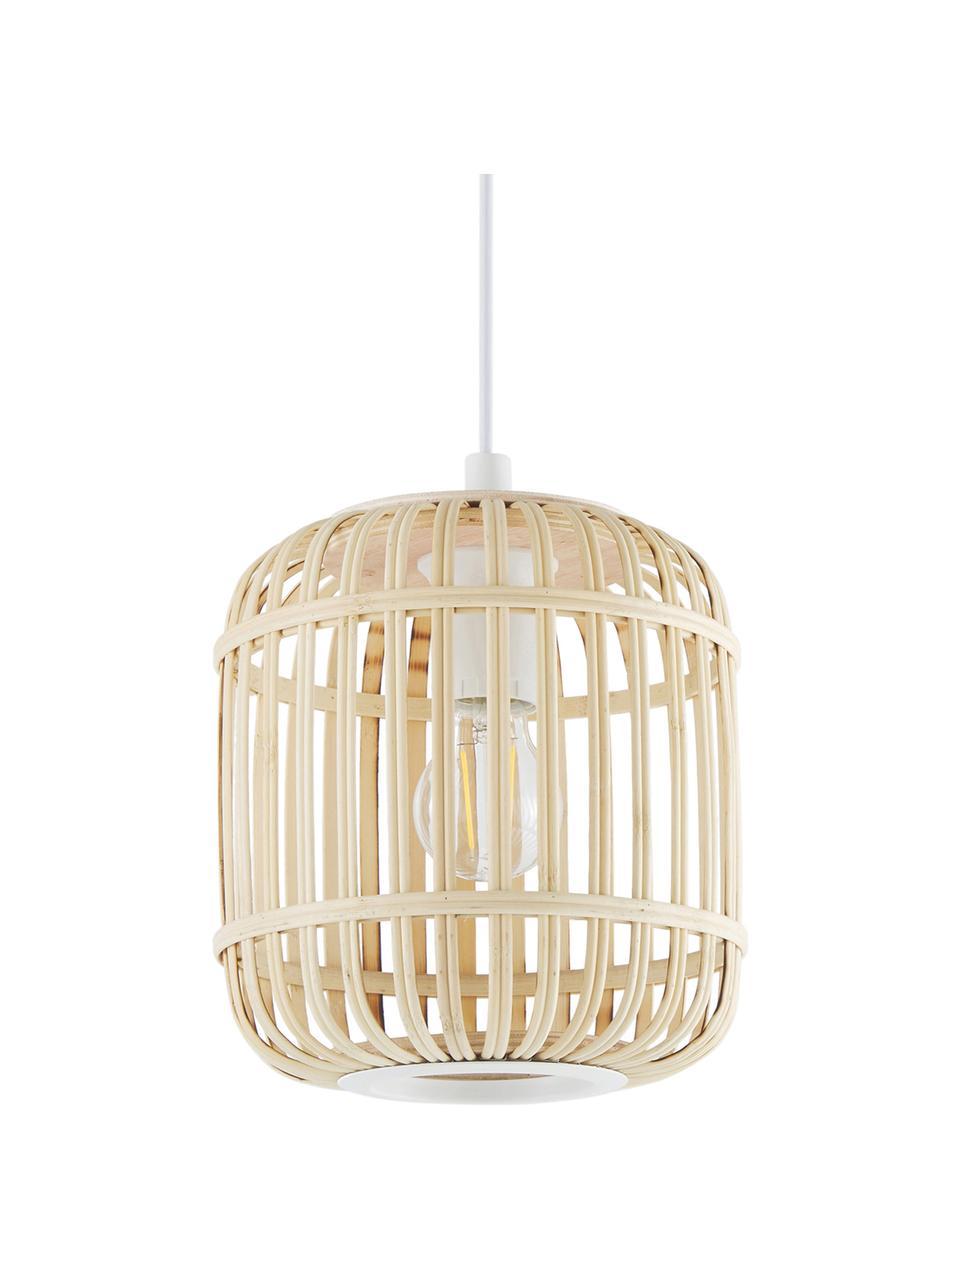 Lampada a sospensione in bambù Adam, Paralume: bambù legno, Baldacchino: metallo verniciato a polv, Bianco, beige, Ø 21 x Alt. 24 cm